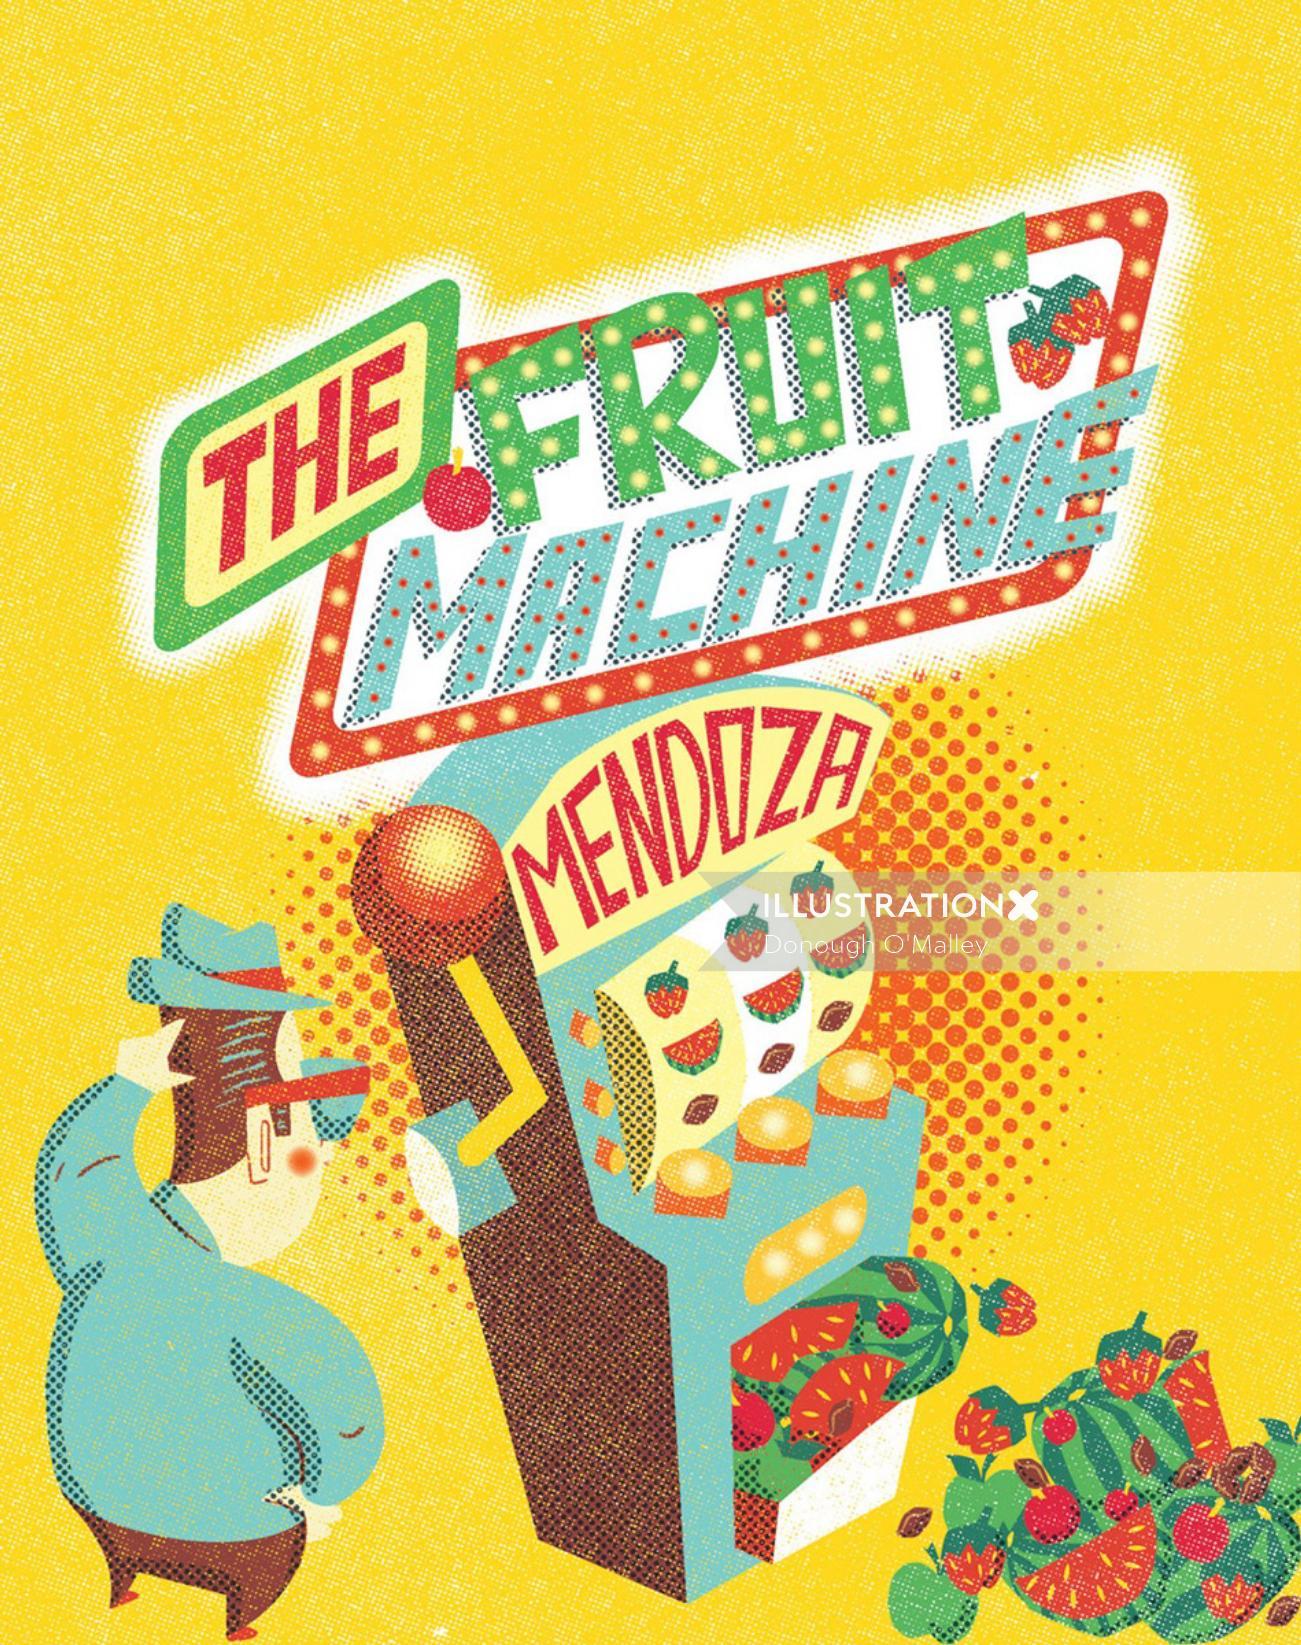 The Fruit Machine Mendoza